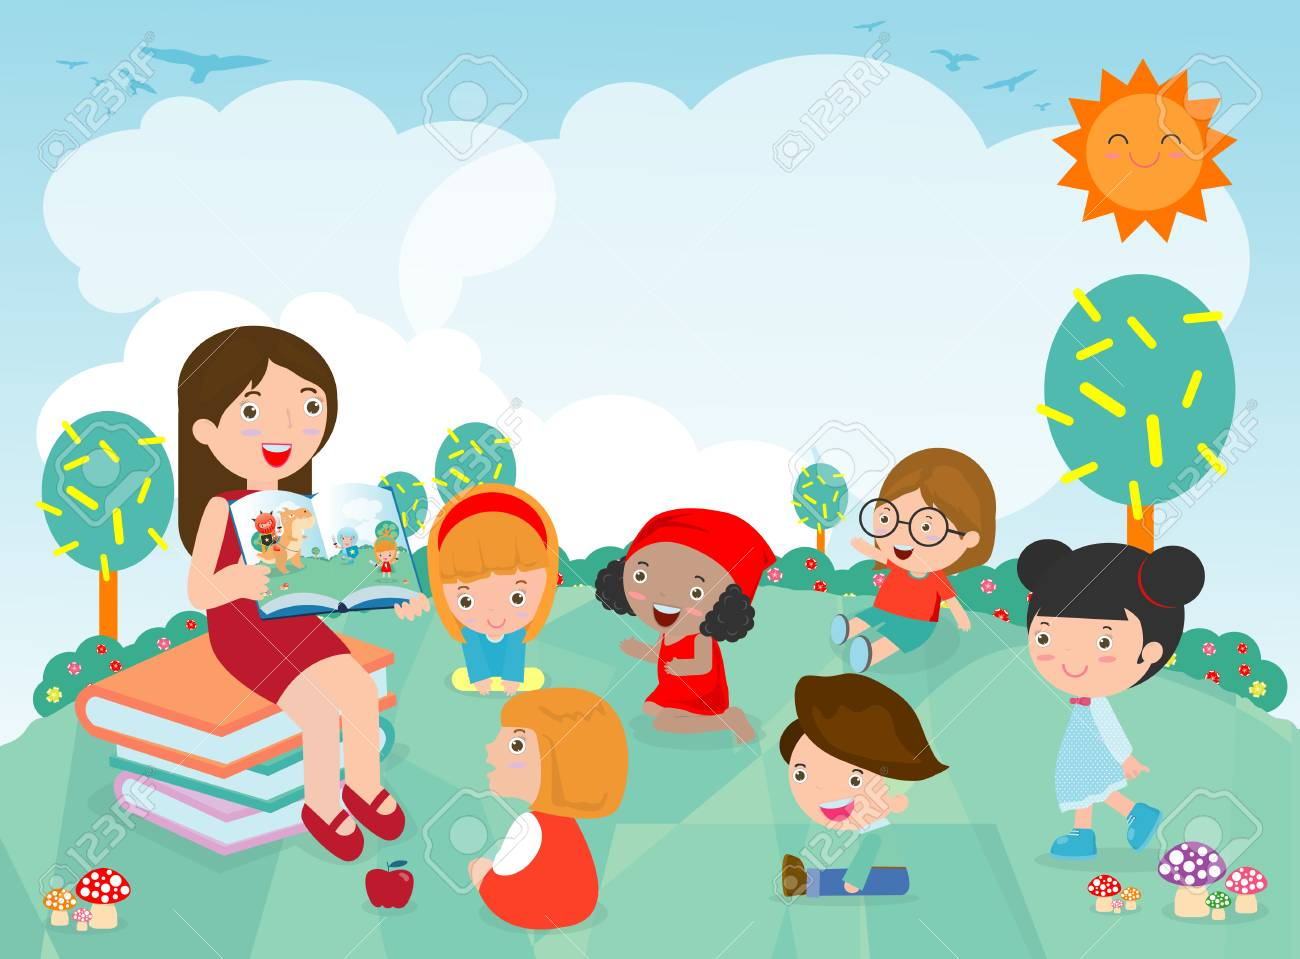 Teacher telling a story to nursery children in the garden, cute Kids Listening to Their teacher Tell a Story, teacher reading books for child in the kindergarten. Vector Illustration - 105479283